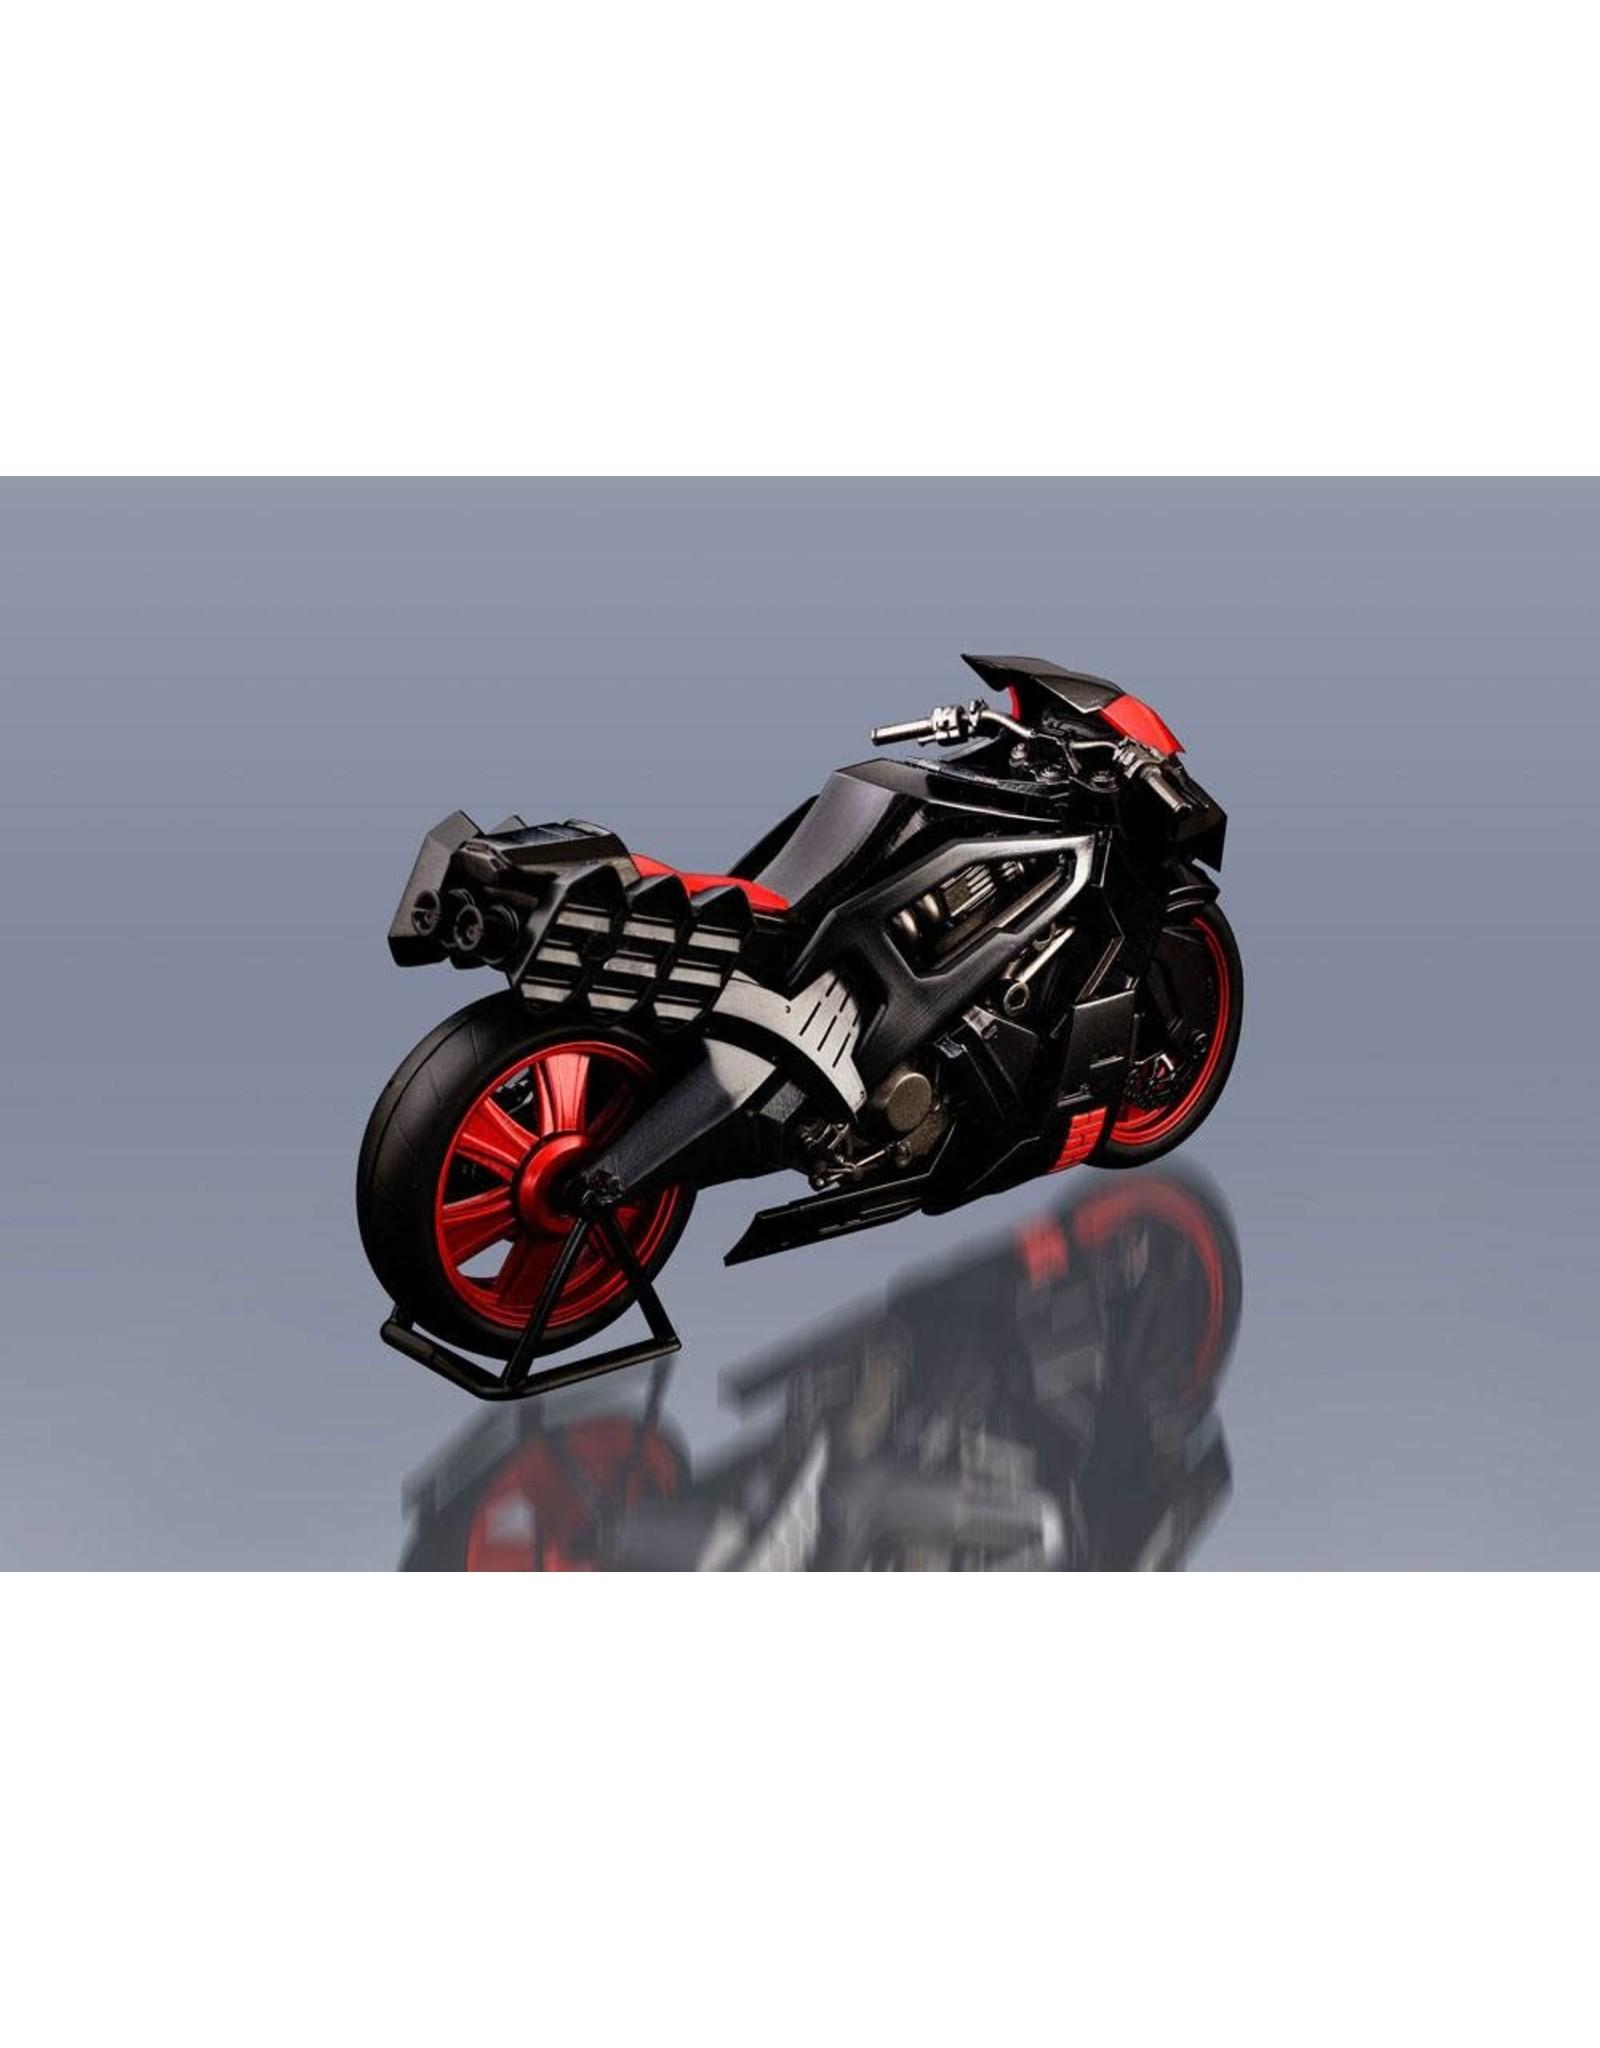 Flame Toys GI JOE Furai Model Plastic Model Kit 15cm - Speed Cycle